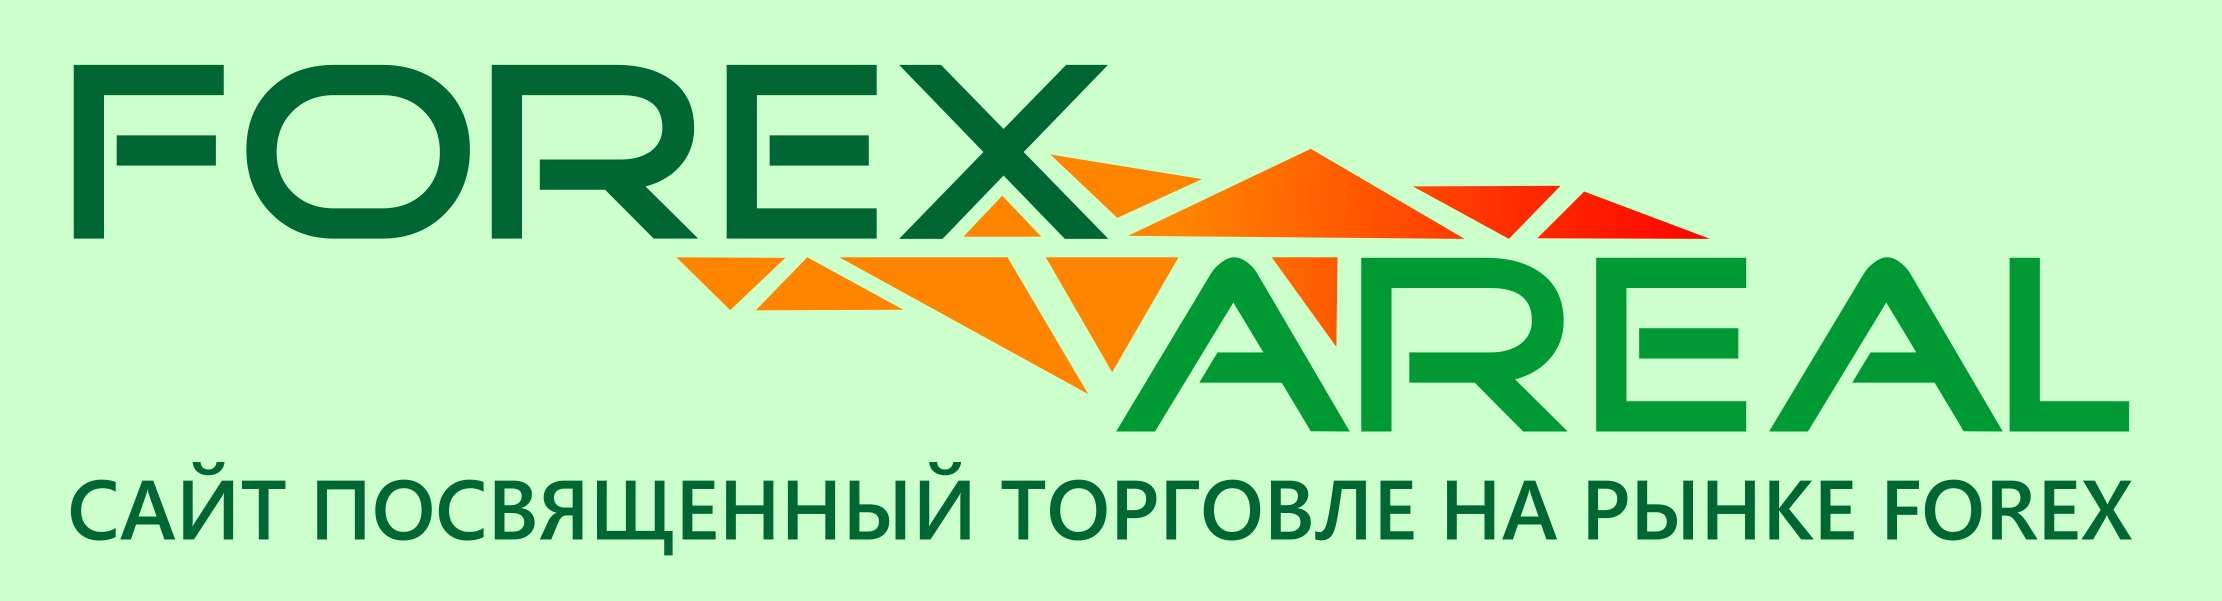 FOREX AREAL — Торговля на рынке Forex